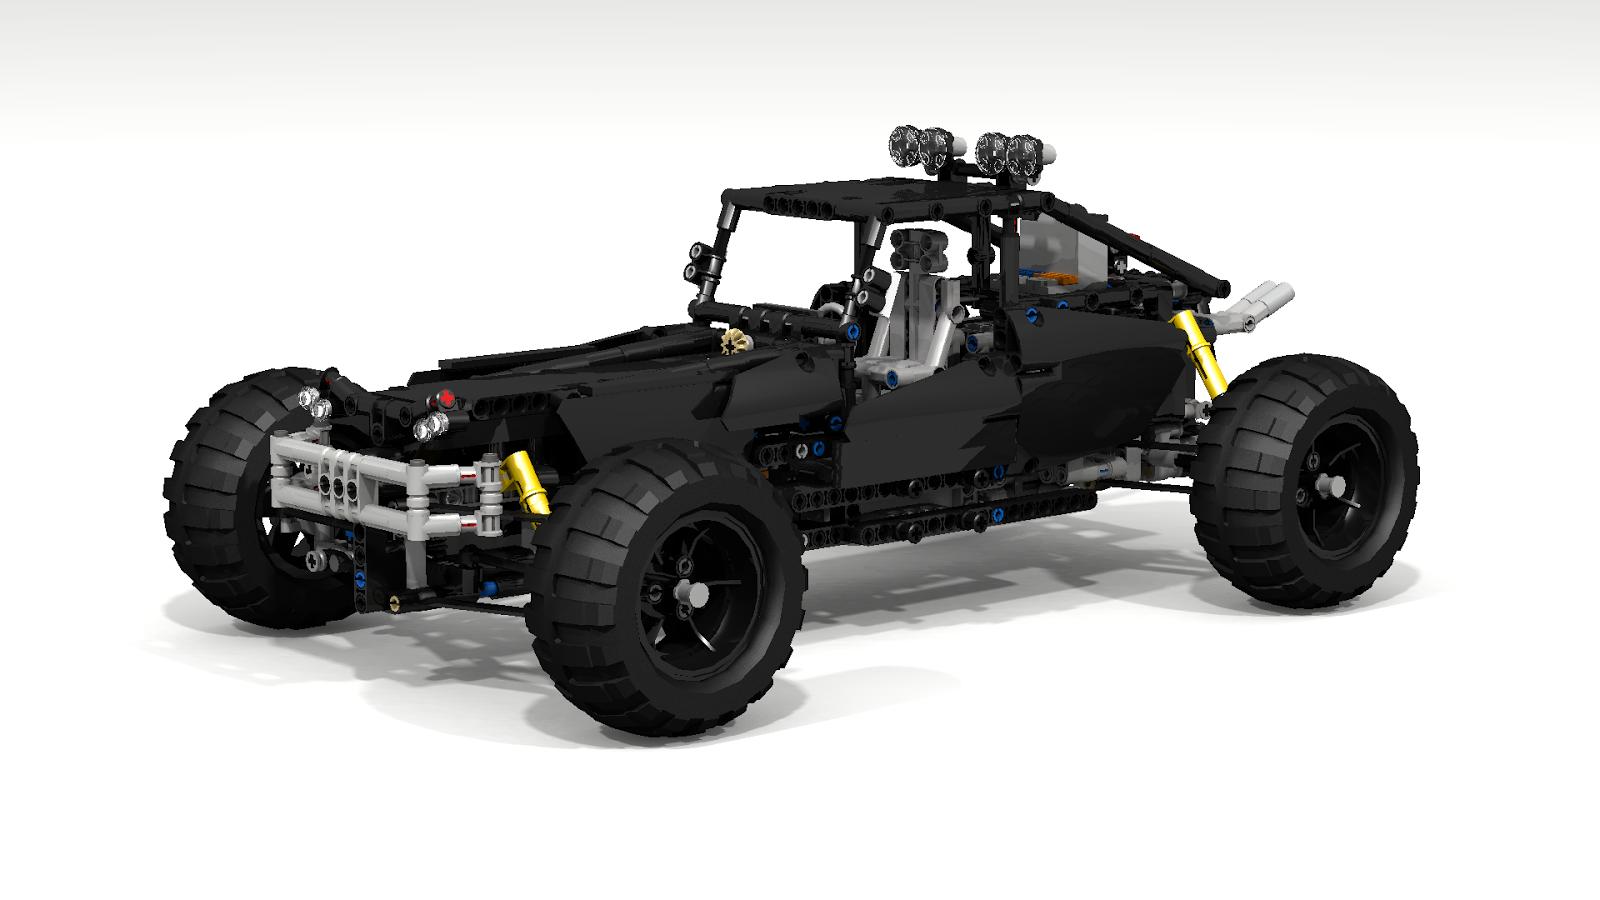 Filsawgood Lego Technic Creations Filsawgood Lego Technic Creations